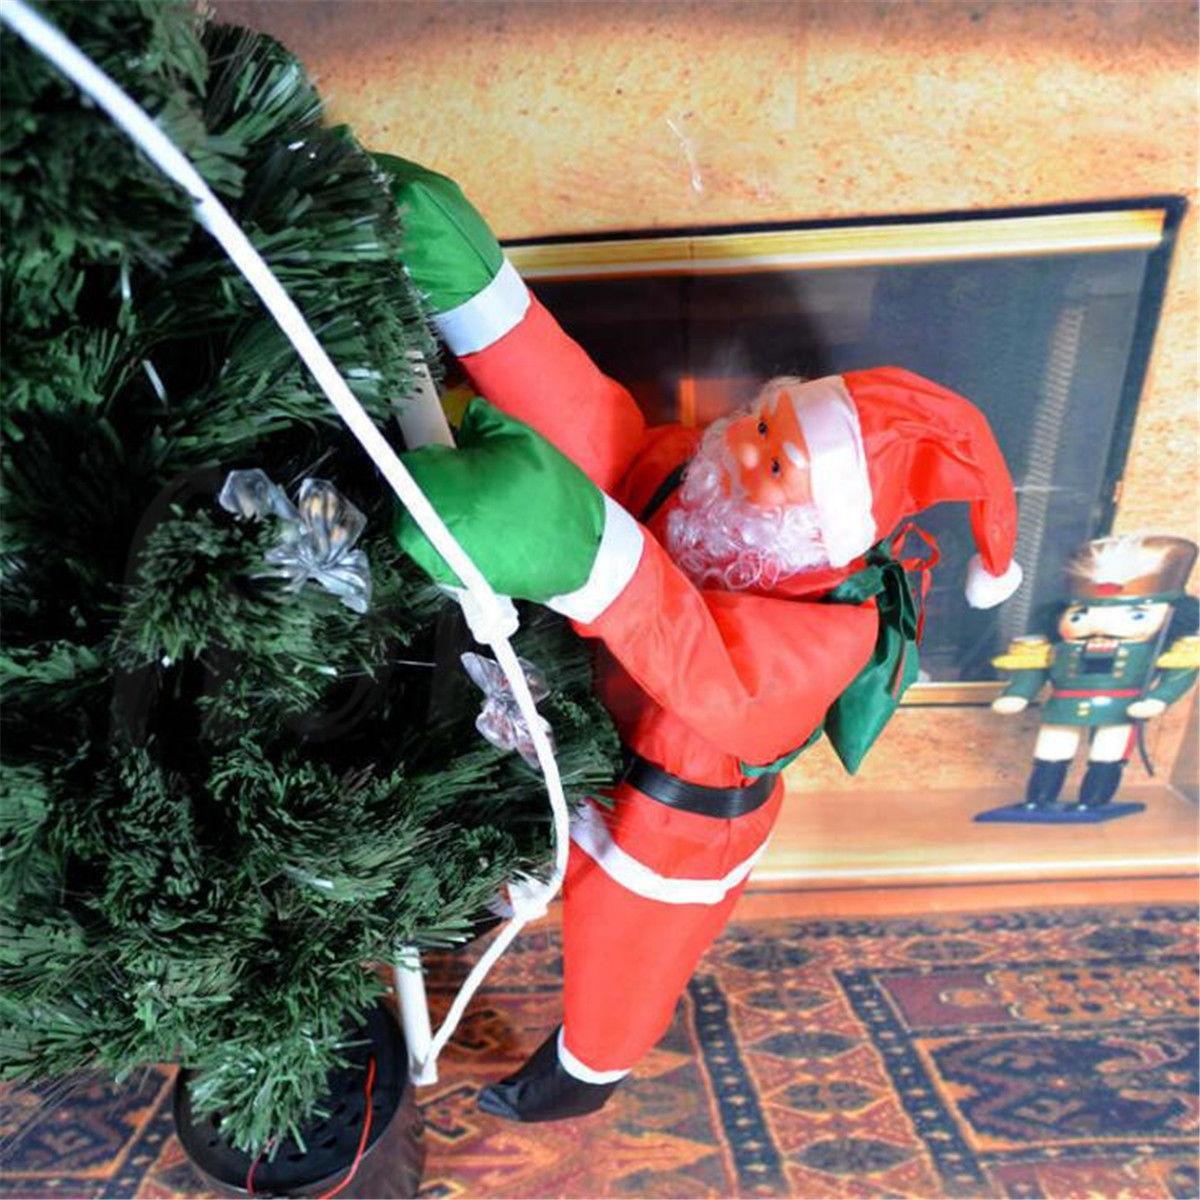 Ползущие Санта Клаусы на лестнице